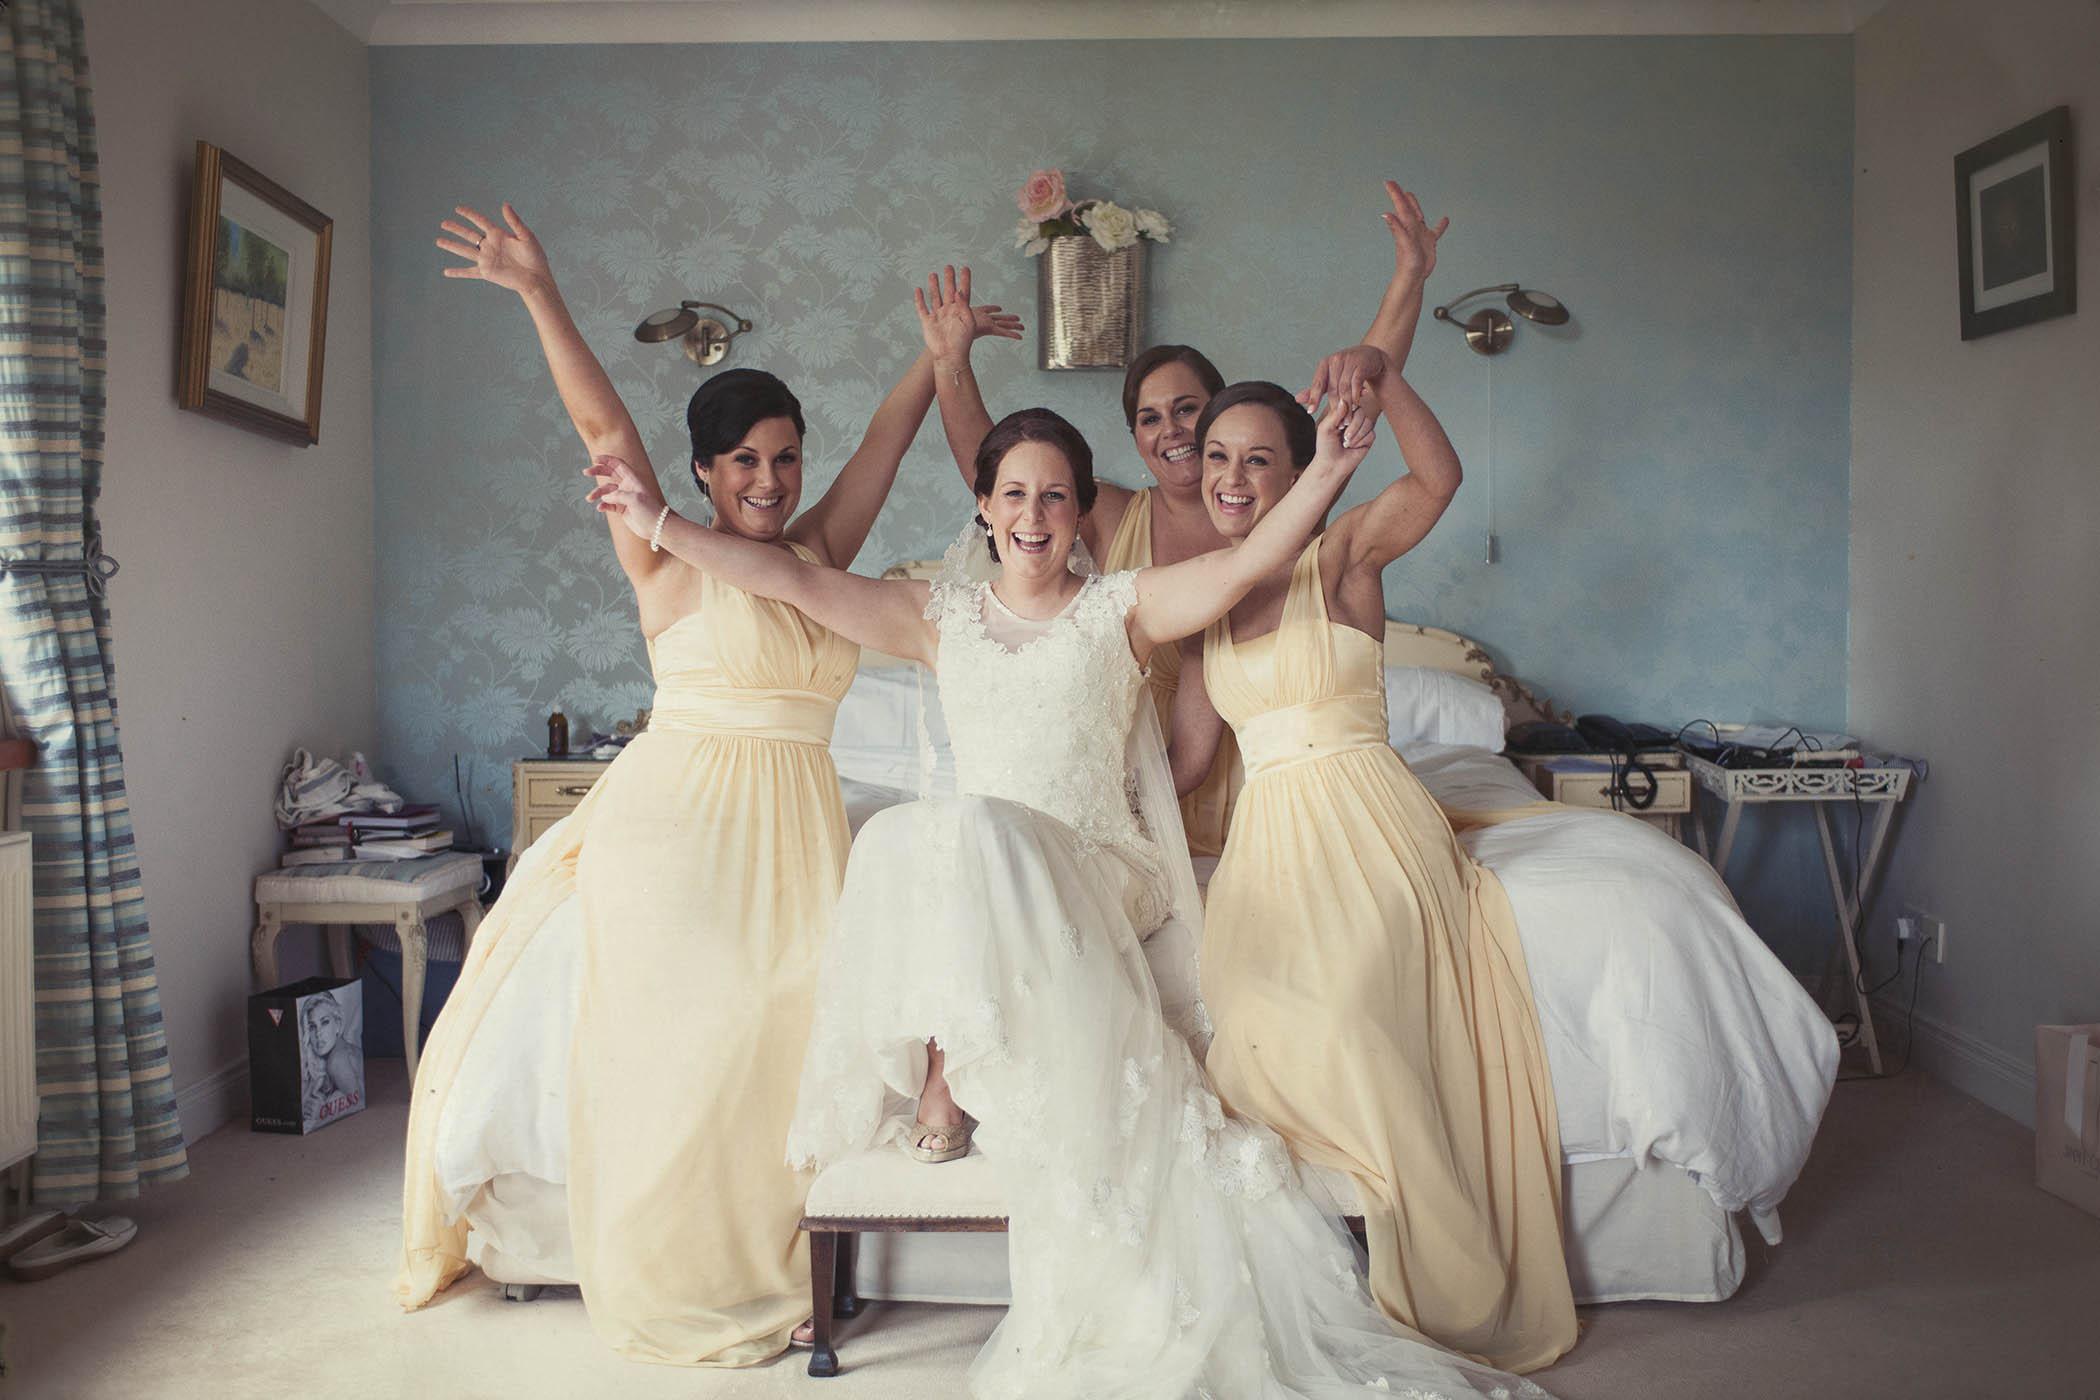 Druids Glen Wedding 2014, bridal party in bedroom